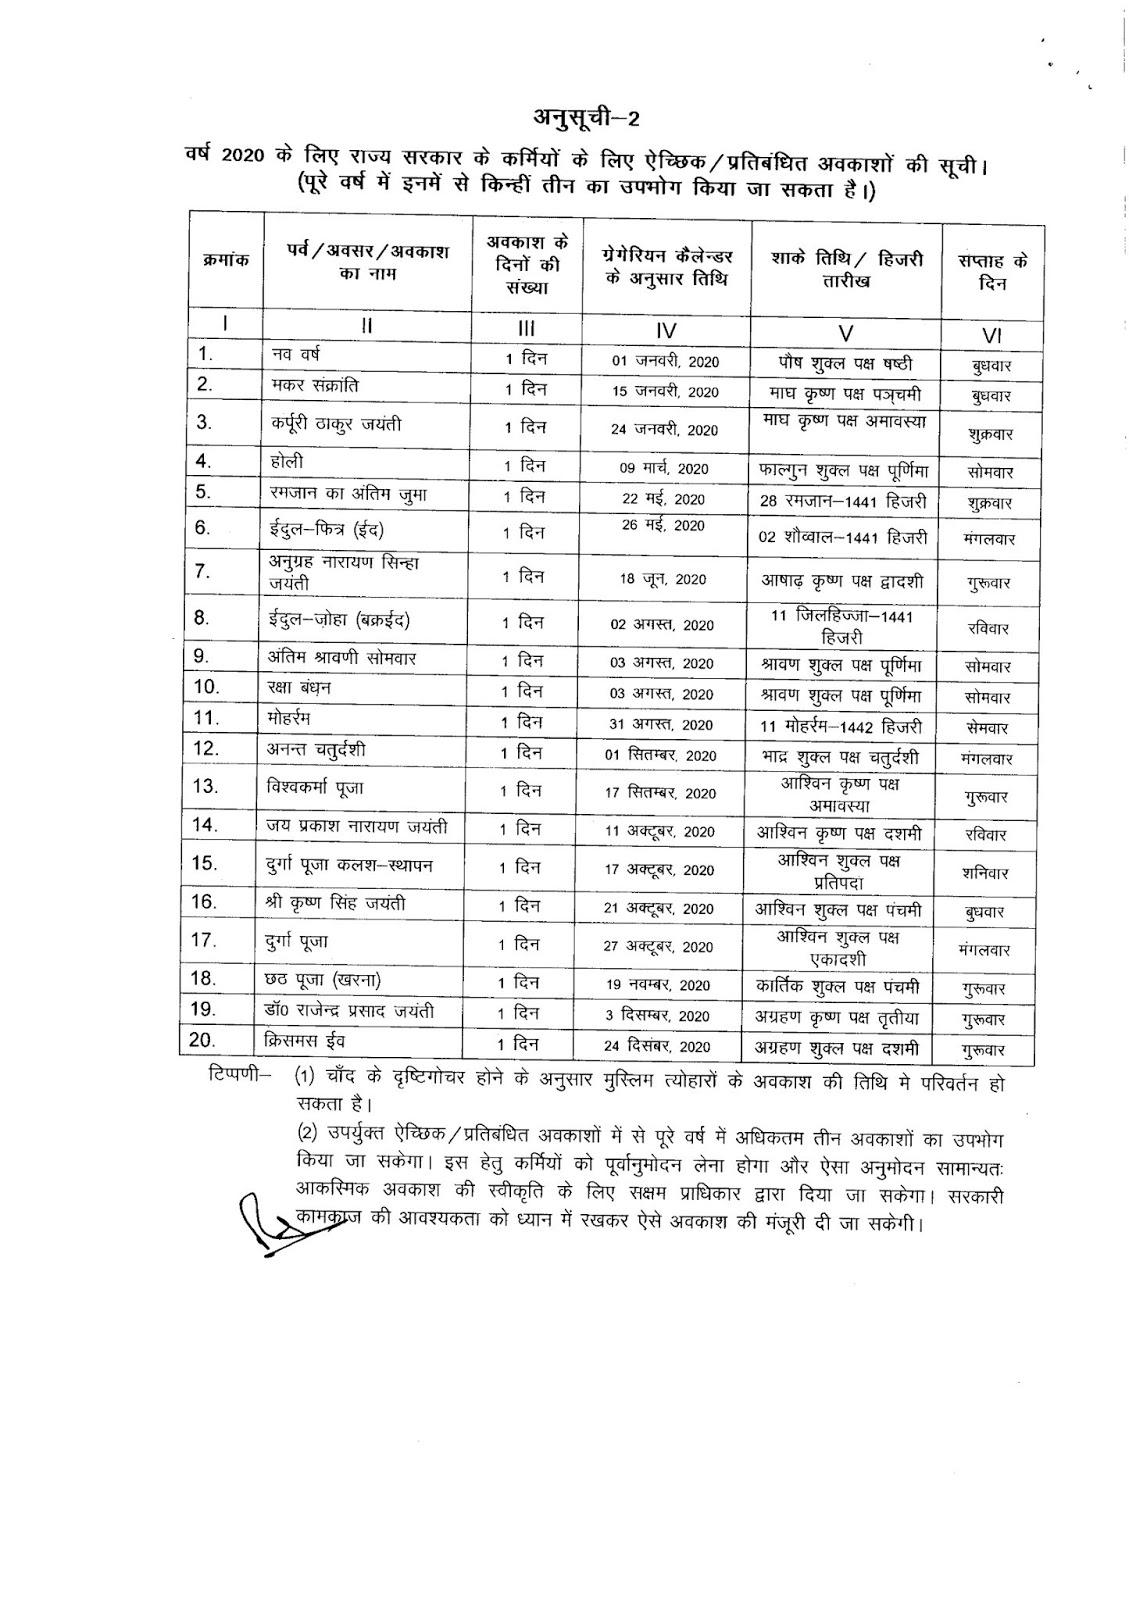 Bihar Government Calendar 2020 #educratsweb intended for Bihar Govt. Calendar 2020